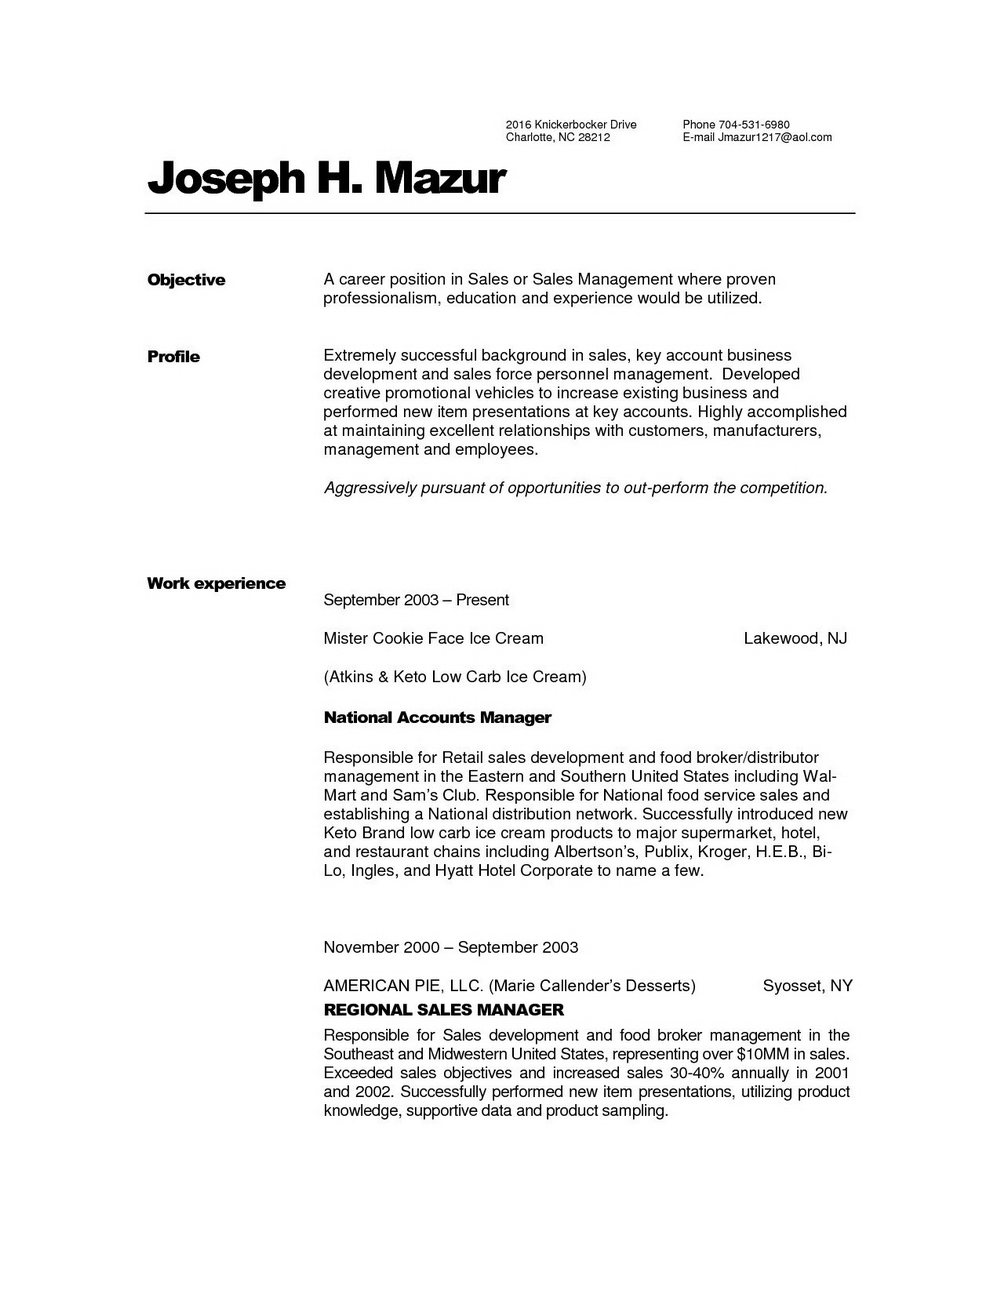 Resume Writing Services Jacksonville Fl